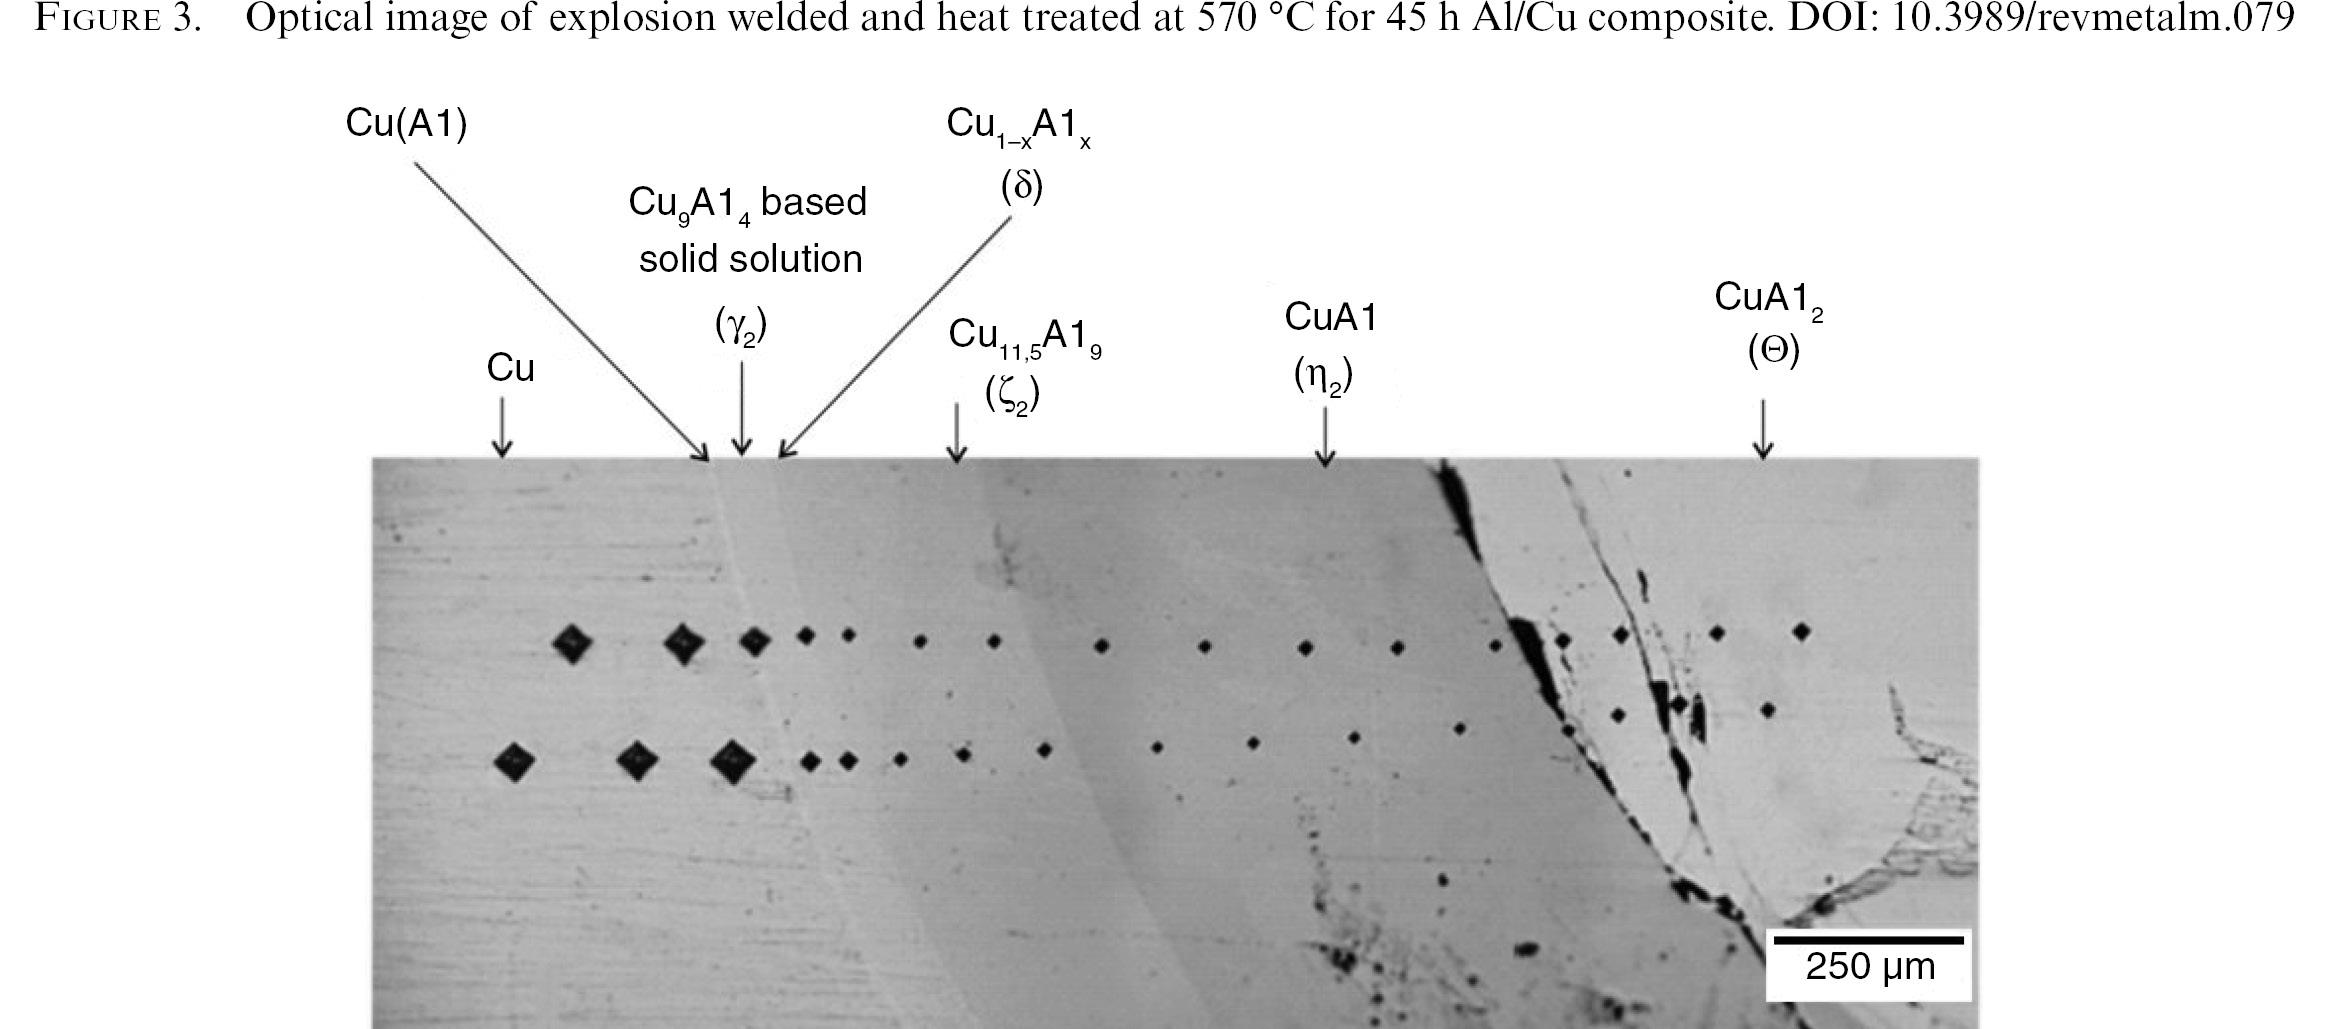 Investigacin Sobre Fusin De Contacto En Materiales Compuestos Explosive Welding Diagram Figure 3 Optical Image Of Explosion Welded